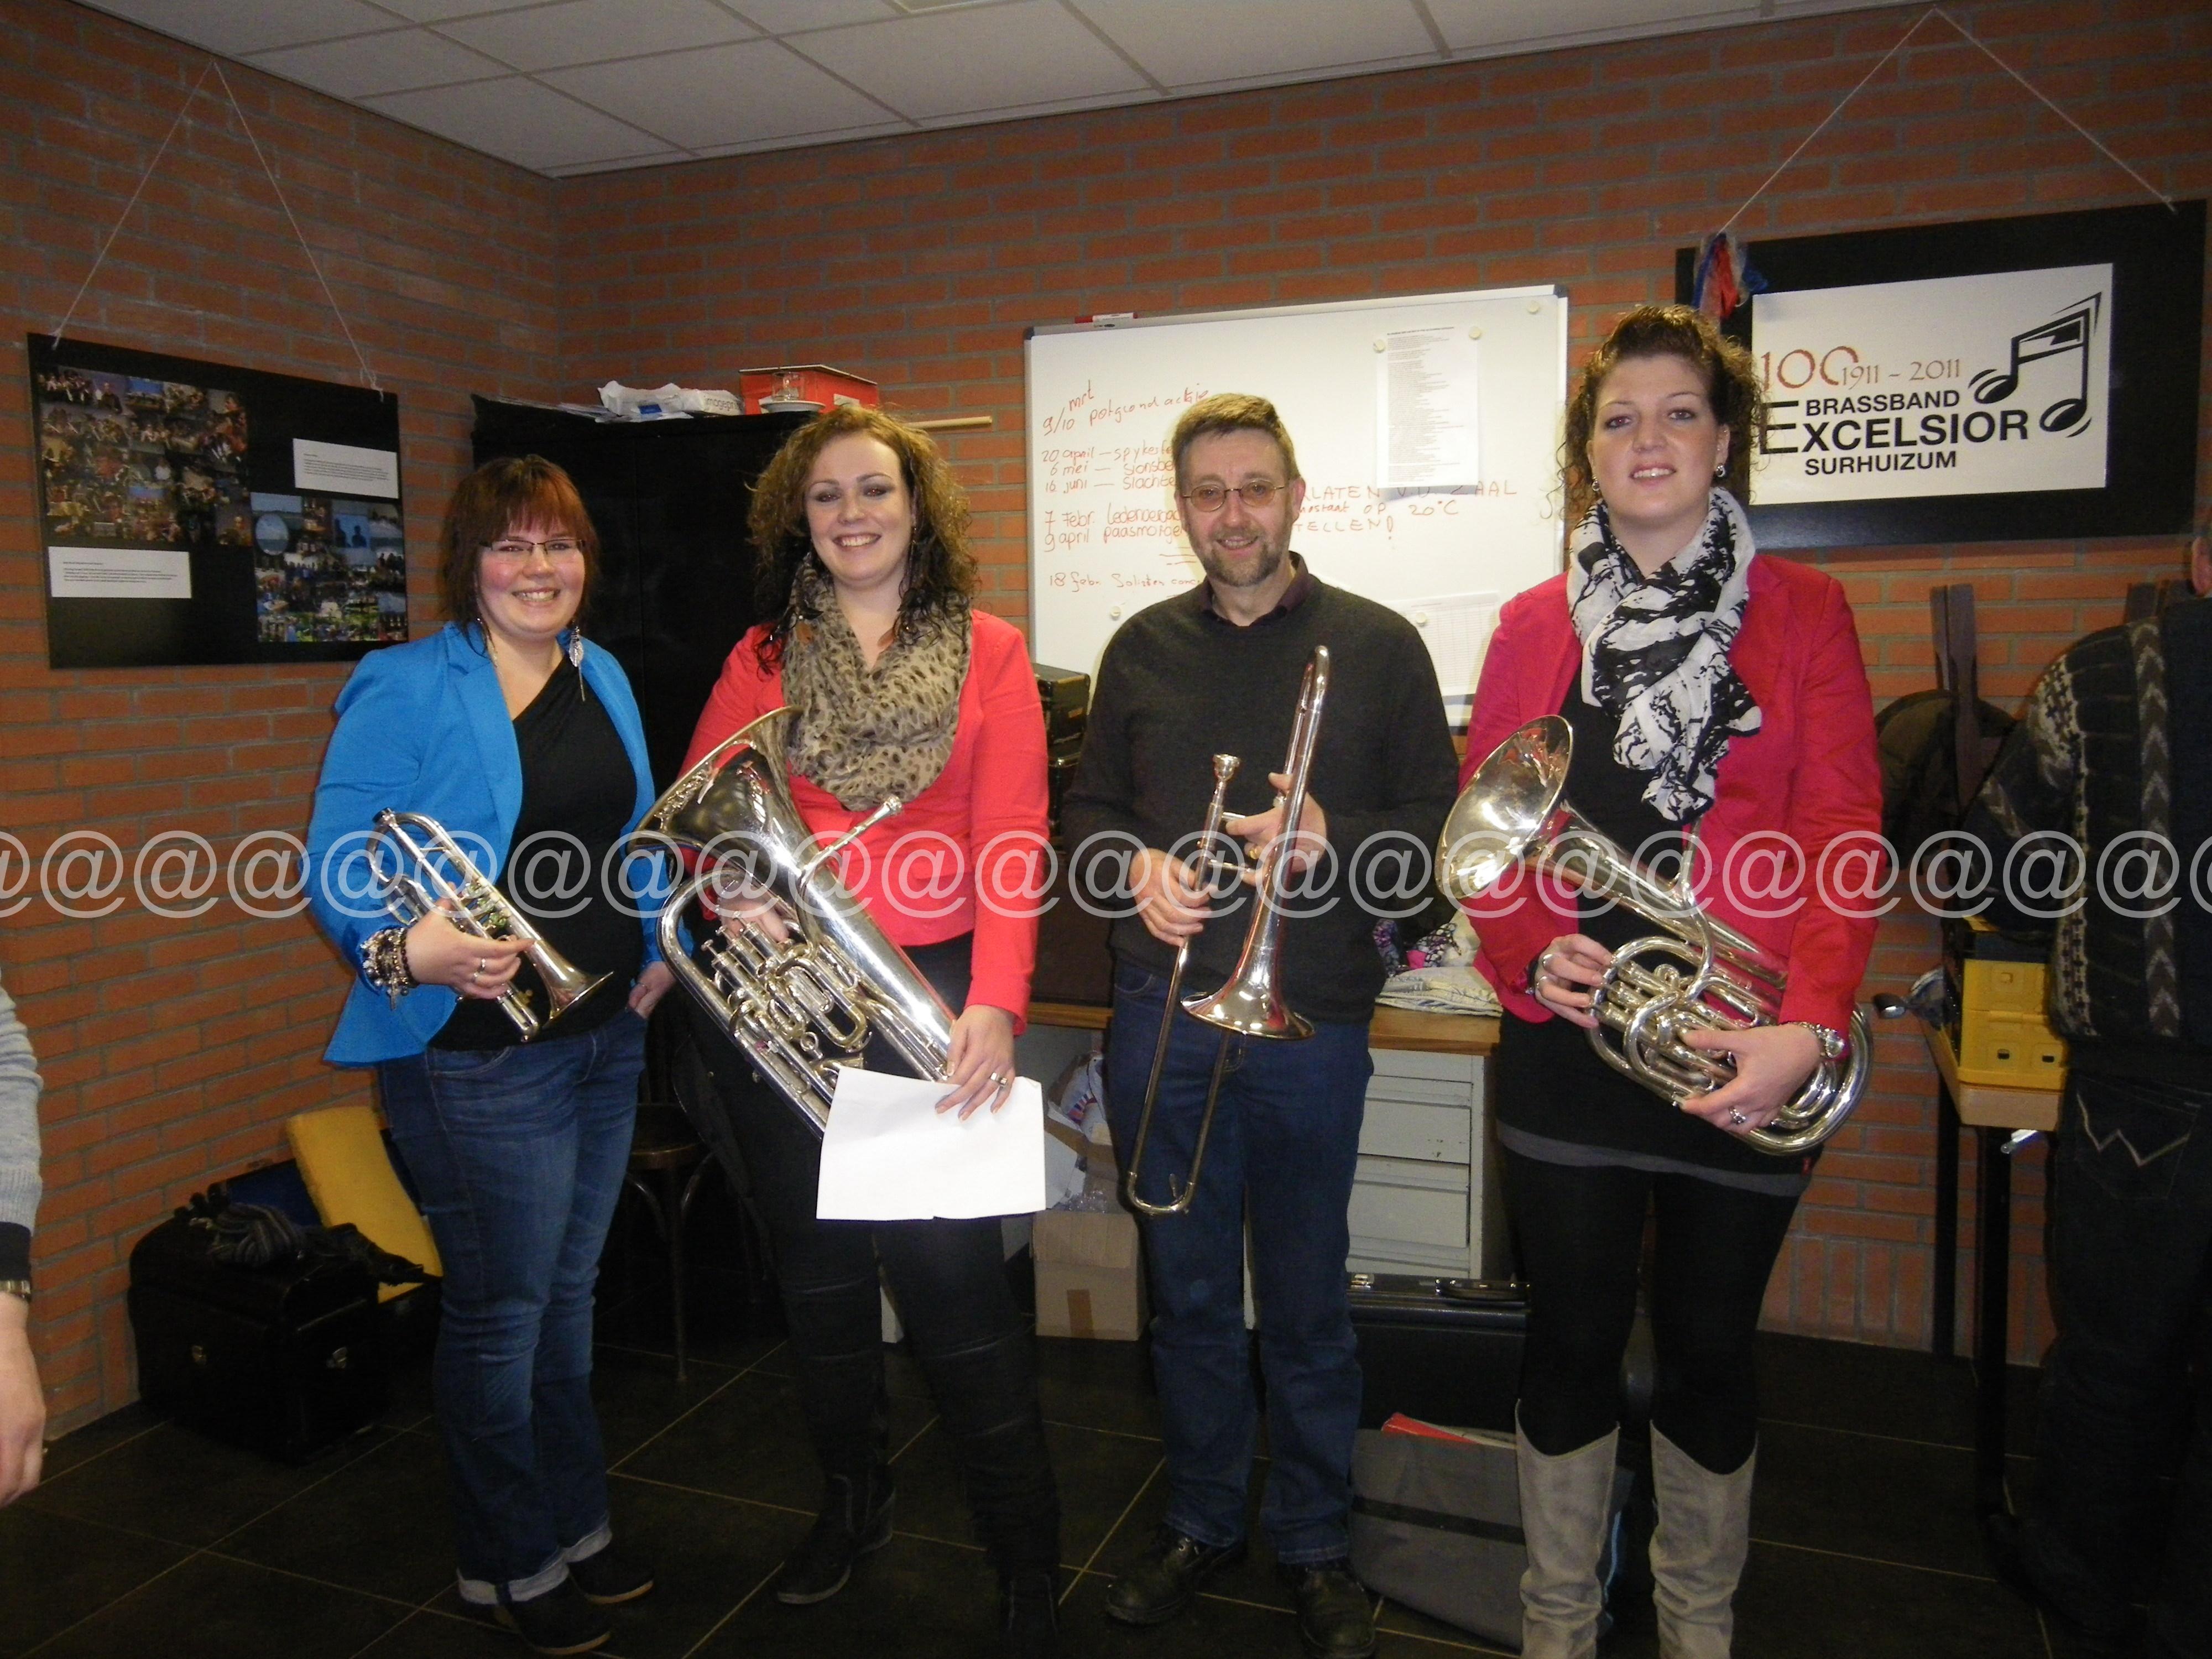 2012 Brassband Excelsior - Solistenconcours